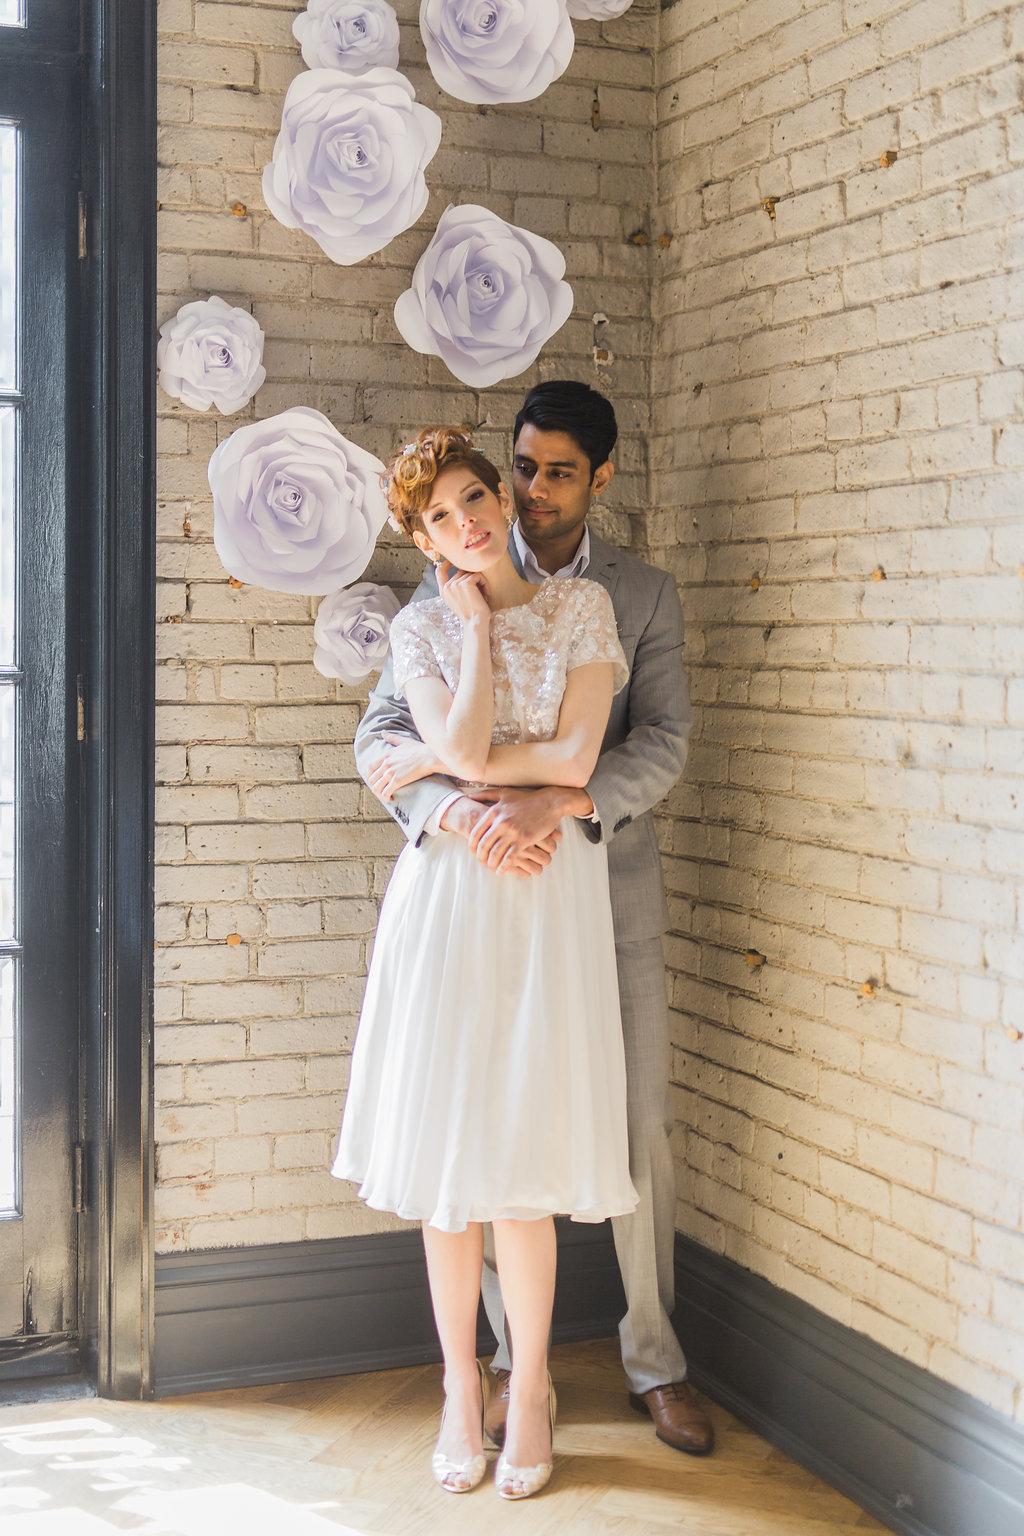 Phoebe Lo Events Toronto Wedding - Storys Building Urban Loft Paper Inspired Wedding 027.jpg